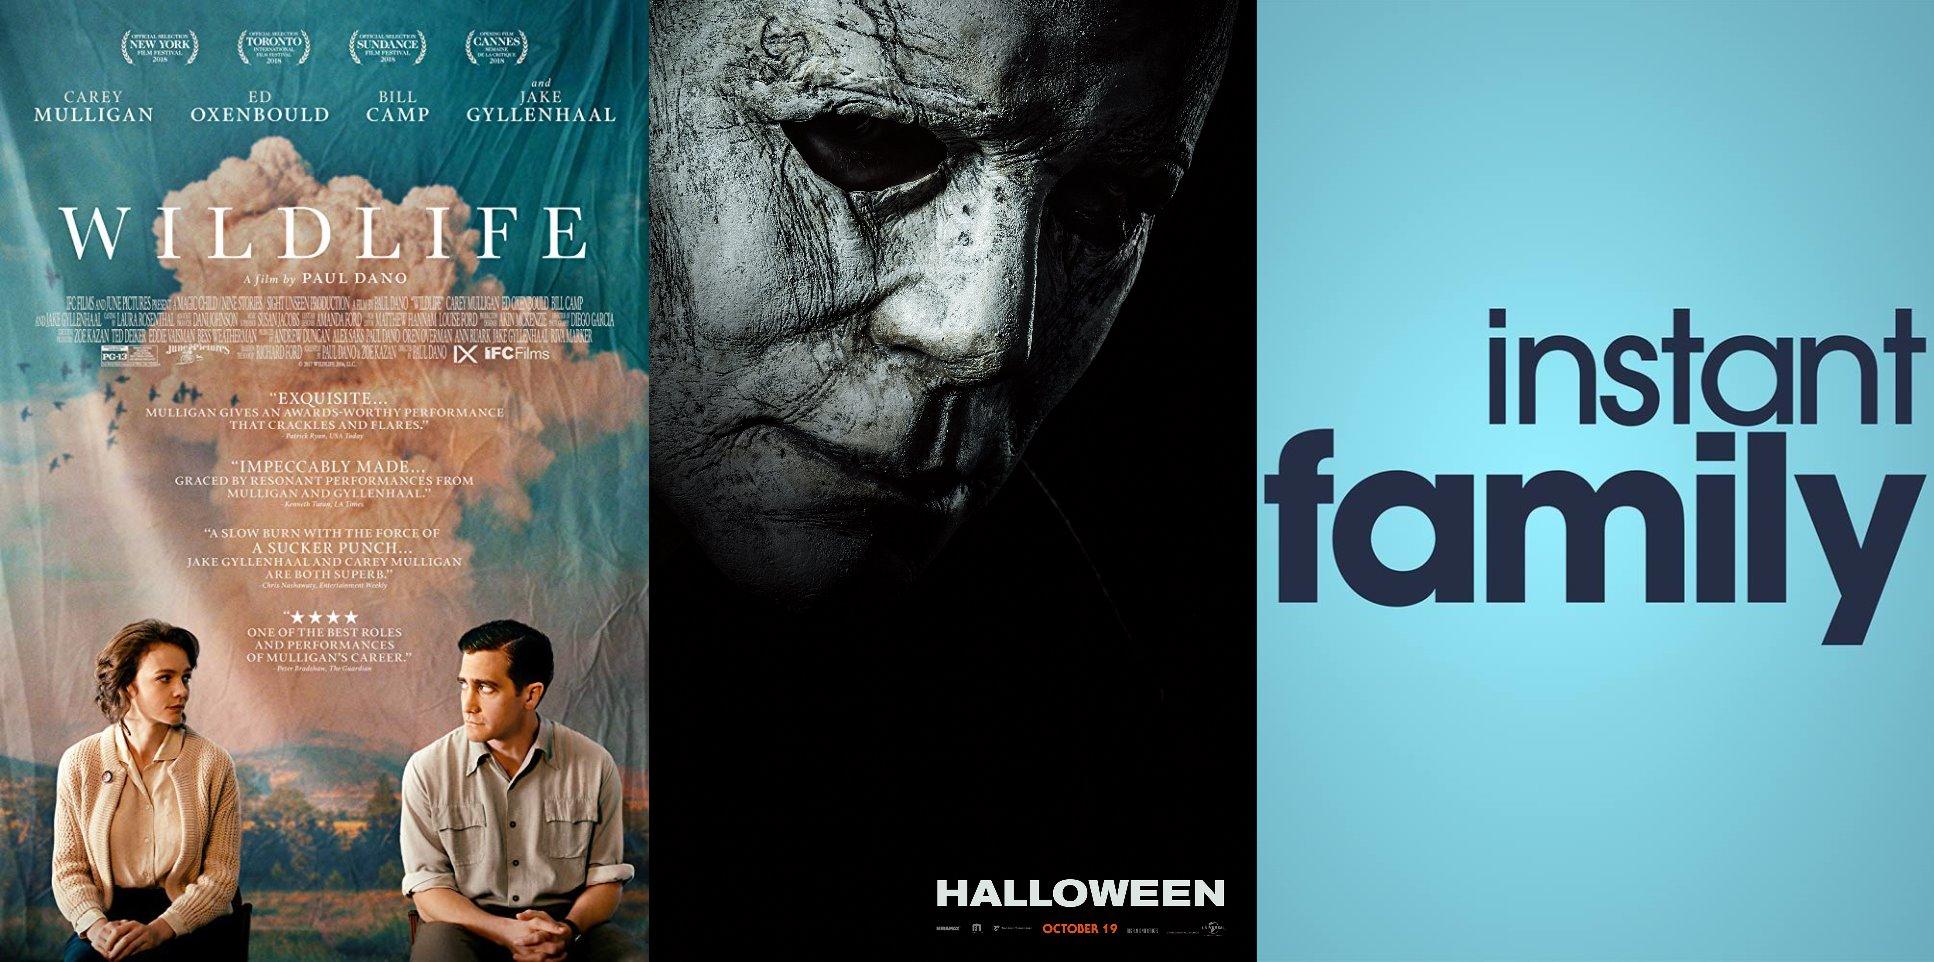 Trailer-Watchin' Wednesday - Halloween (2018), Instant Family, Wildlife